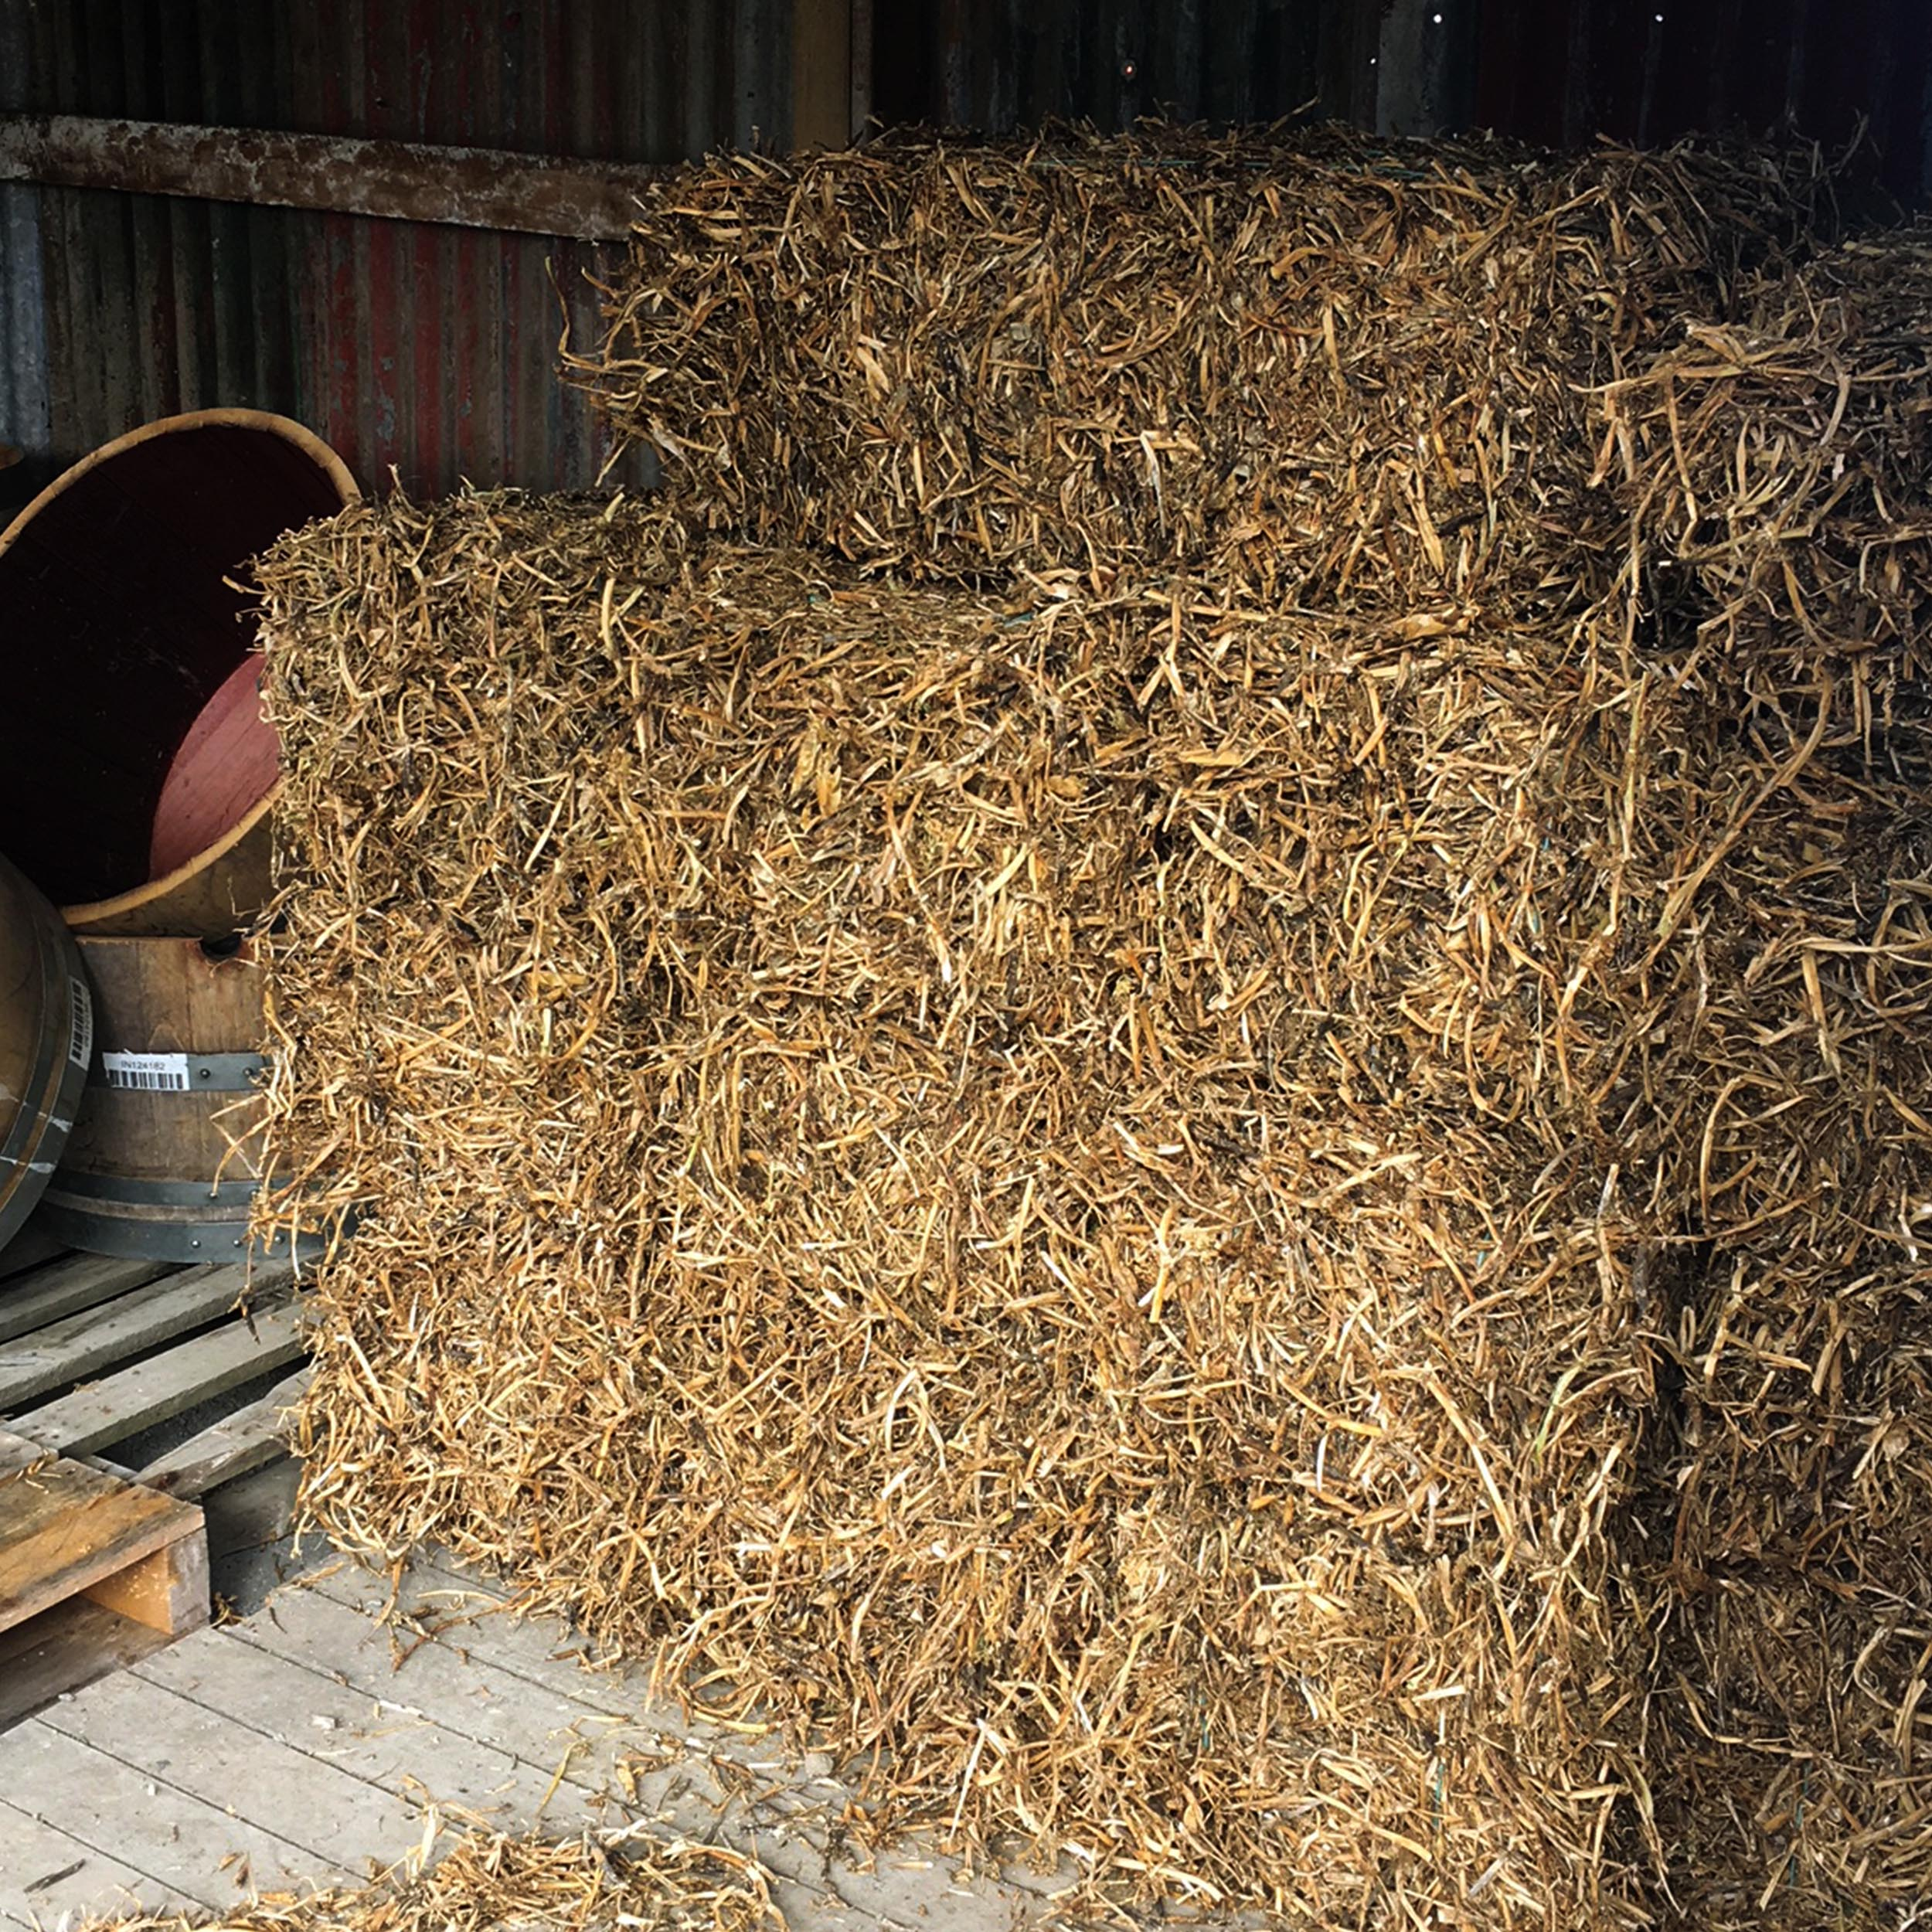 pea straw.jpg